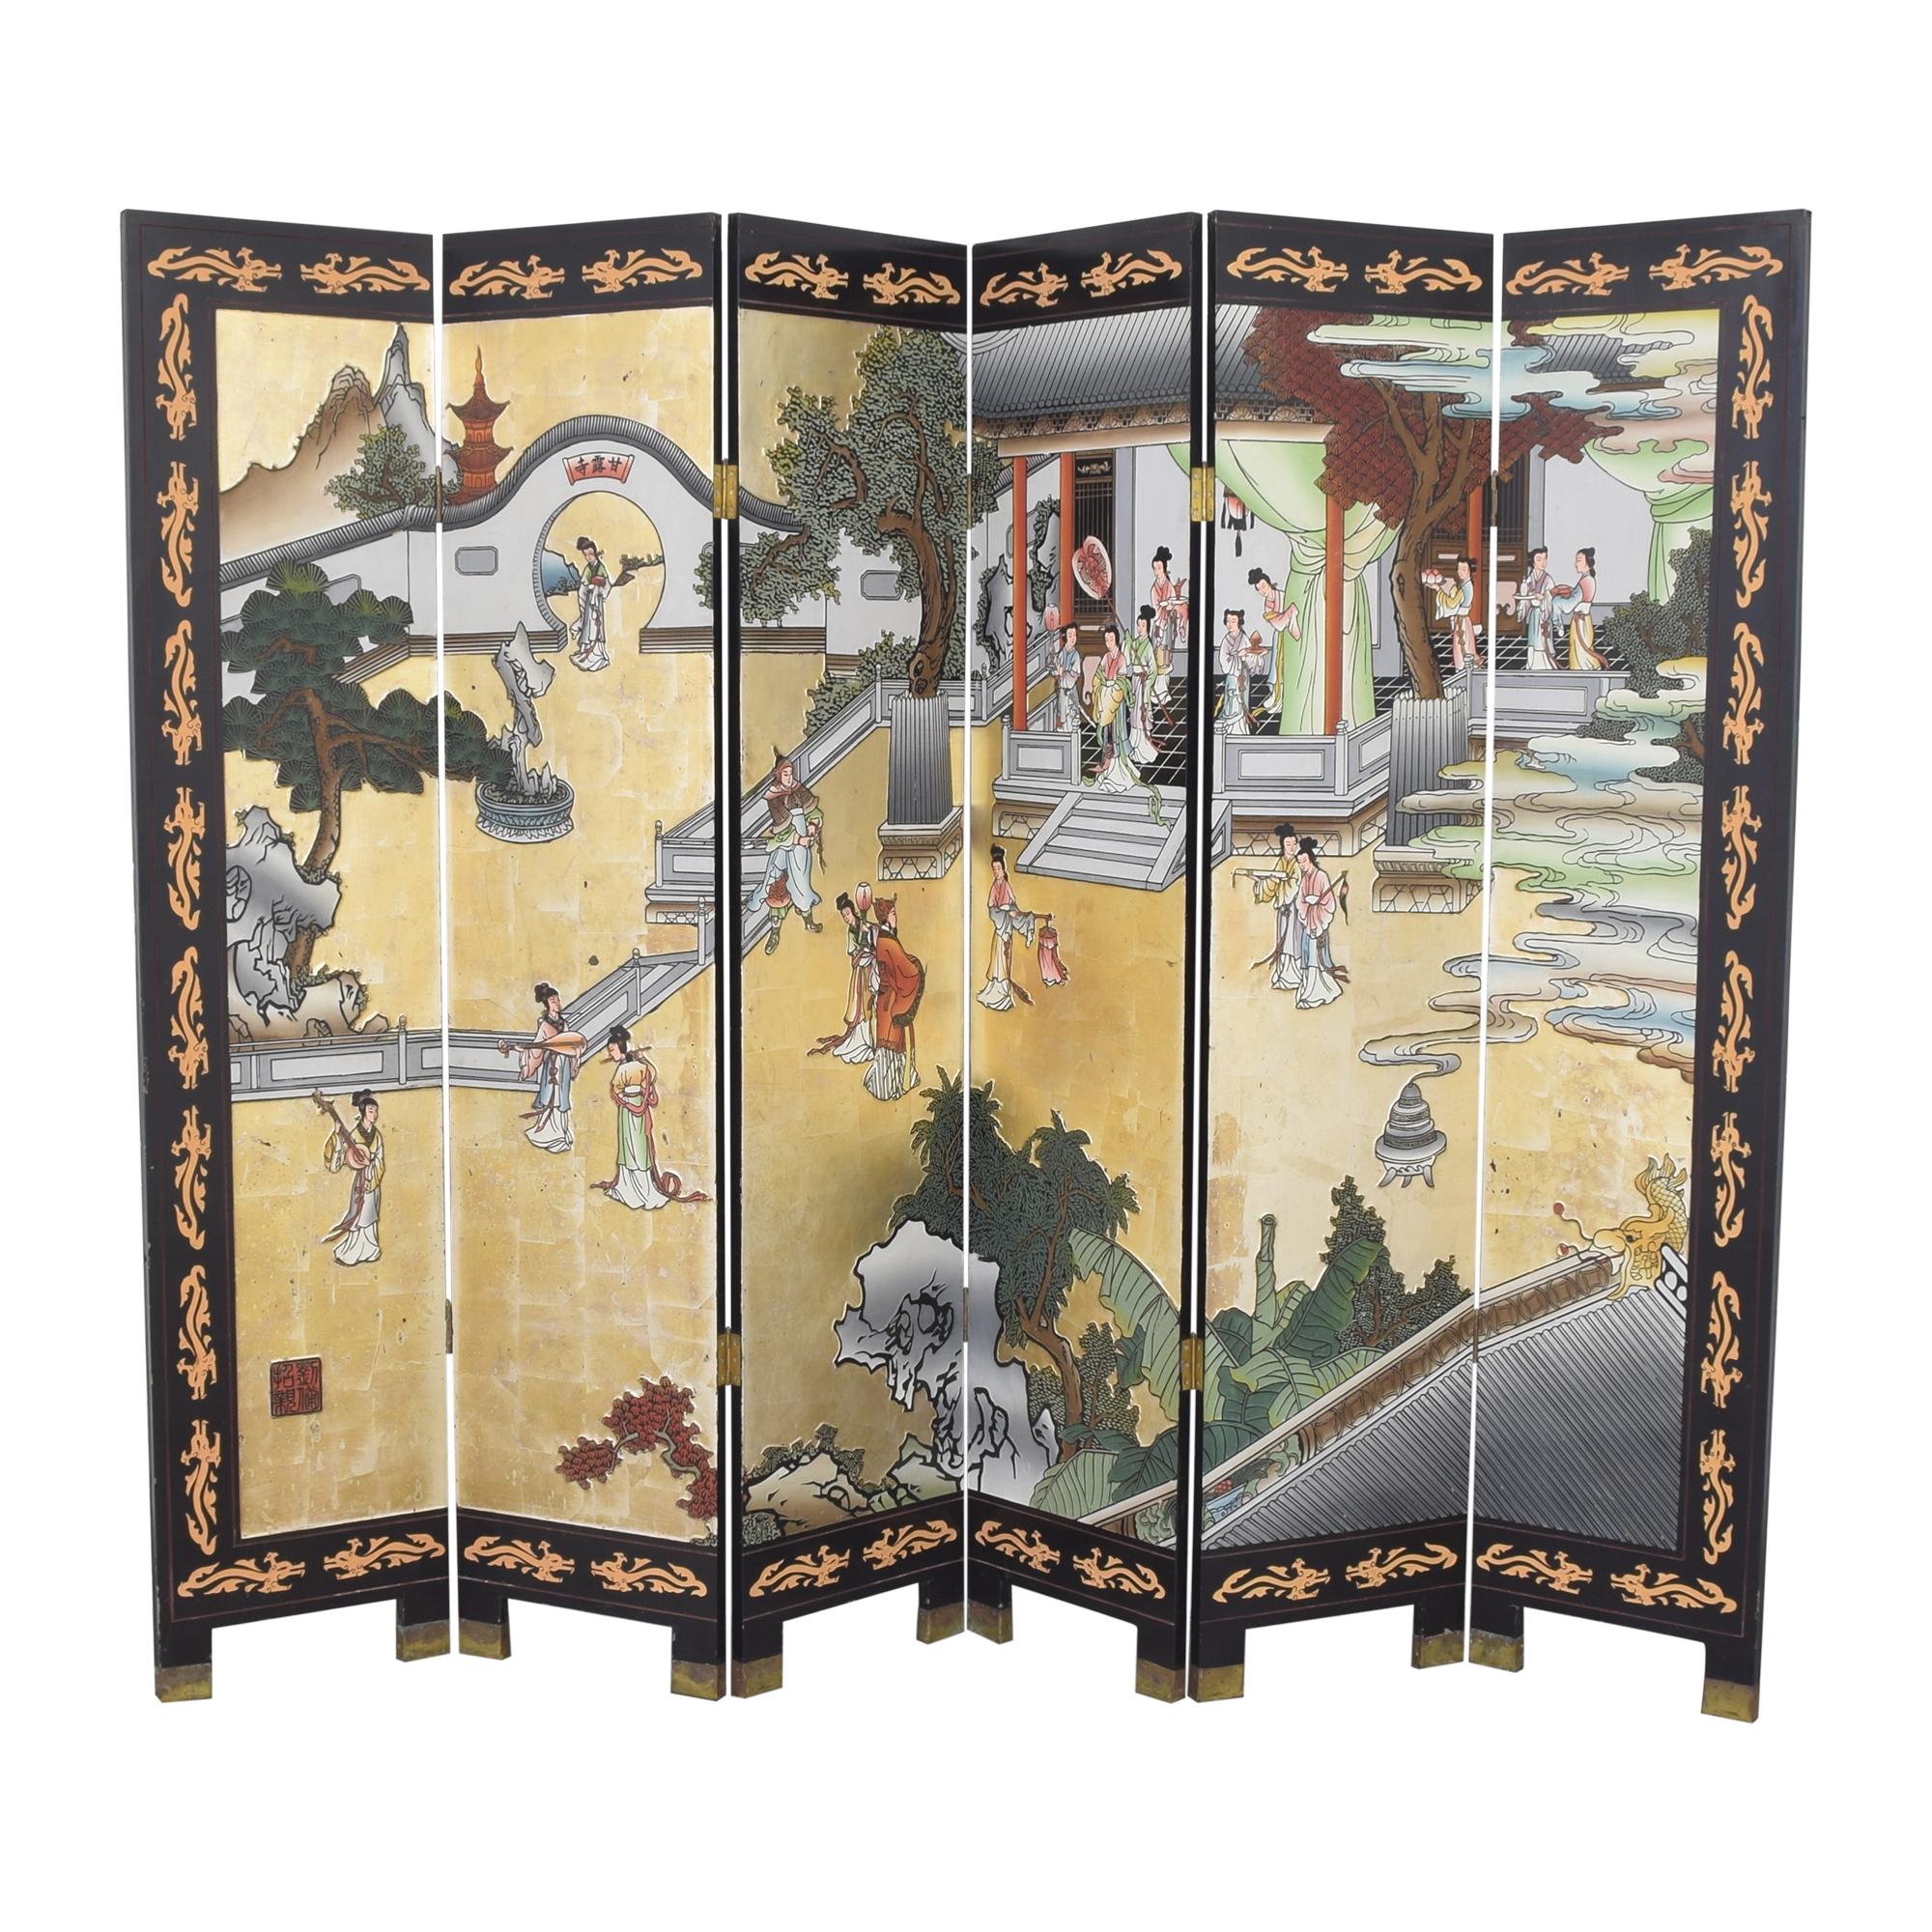 Decorative Panel Screen Divider dimensions